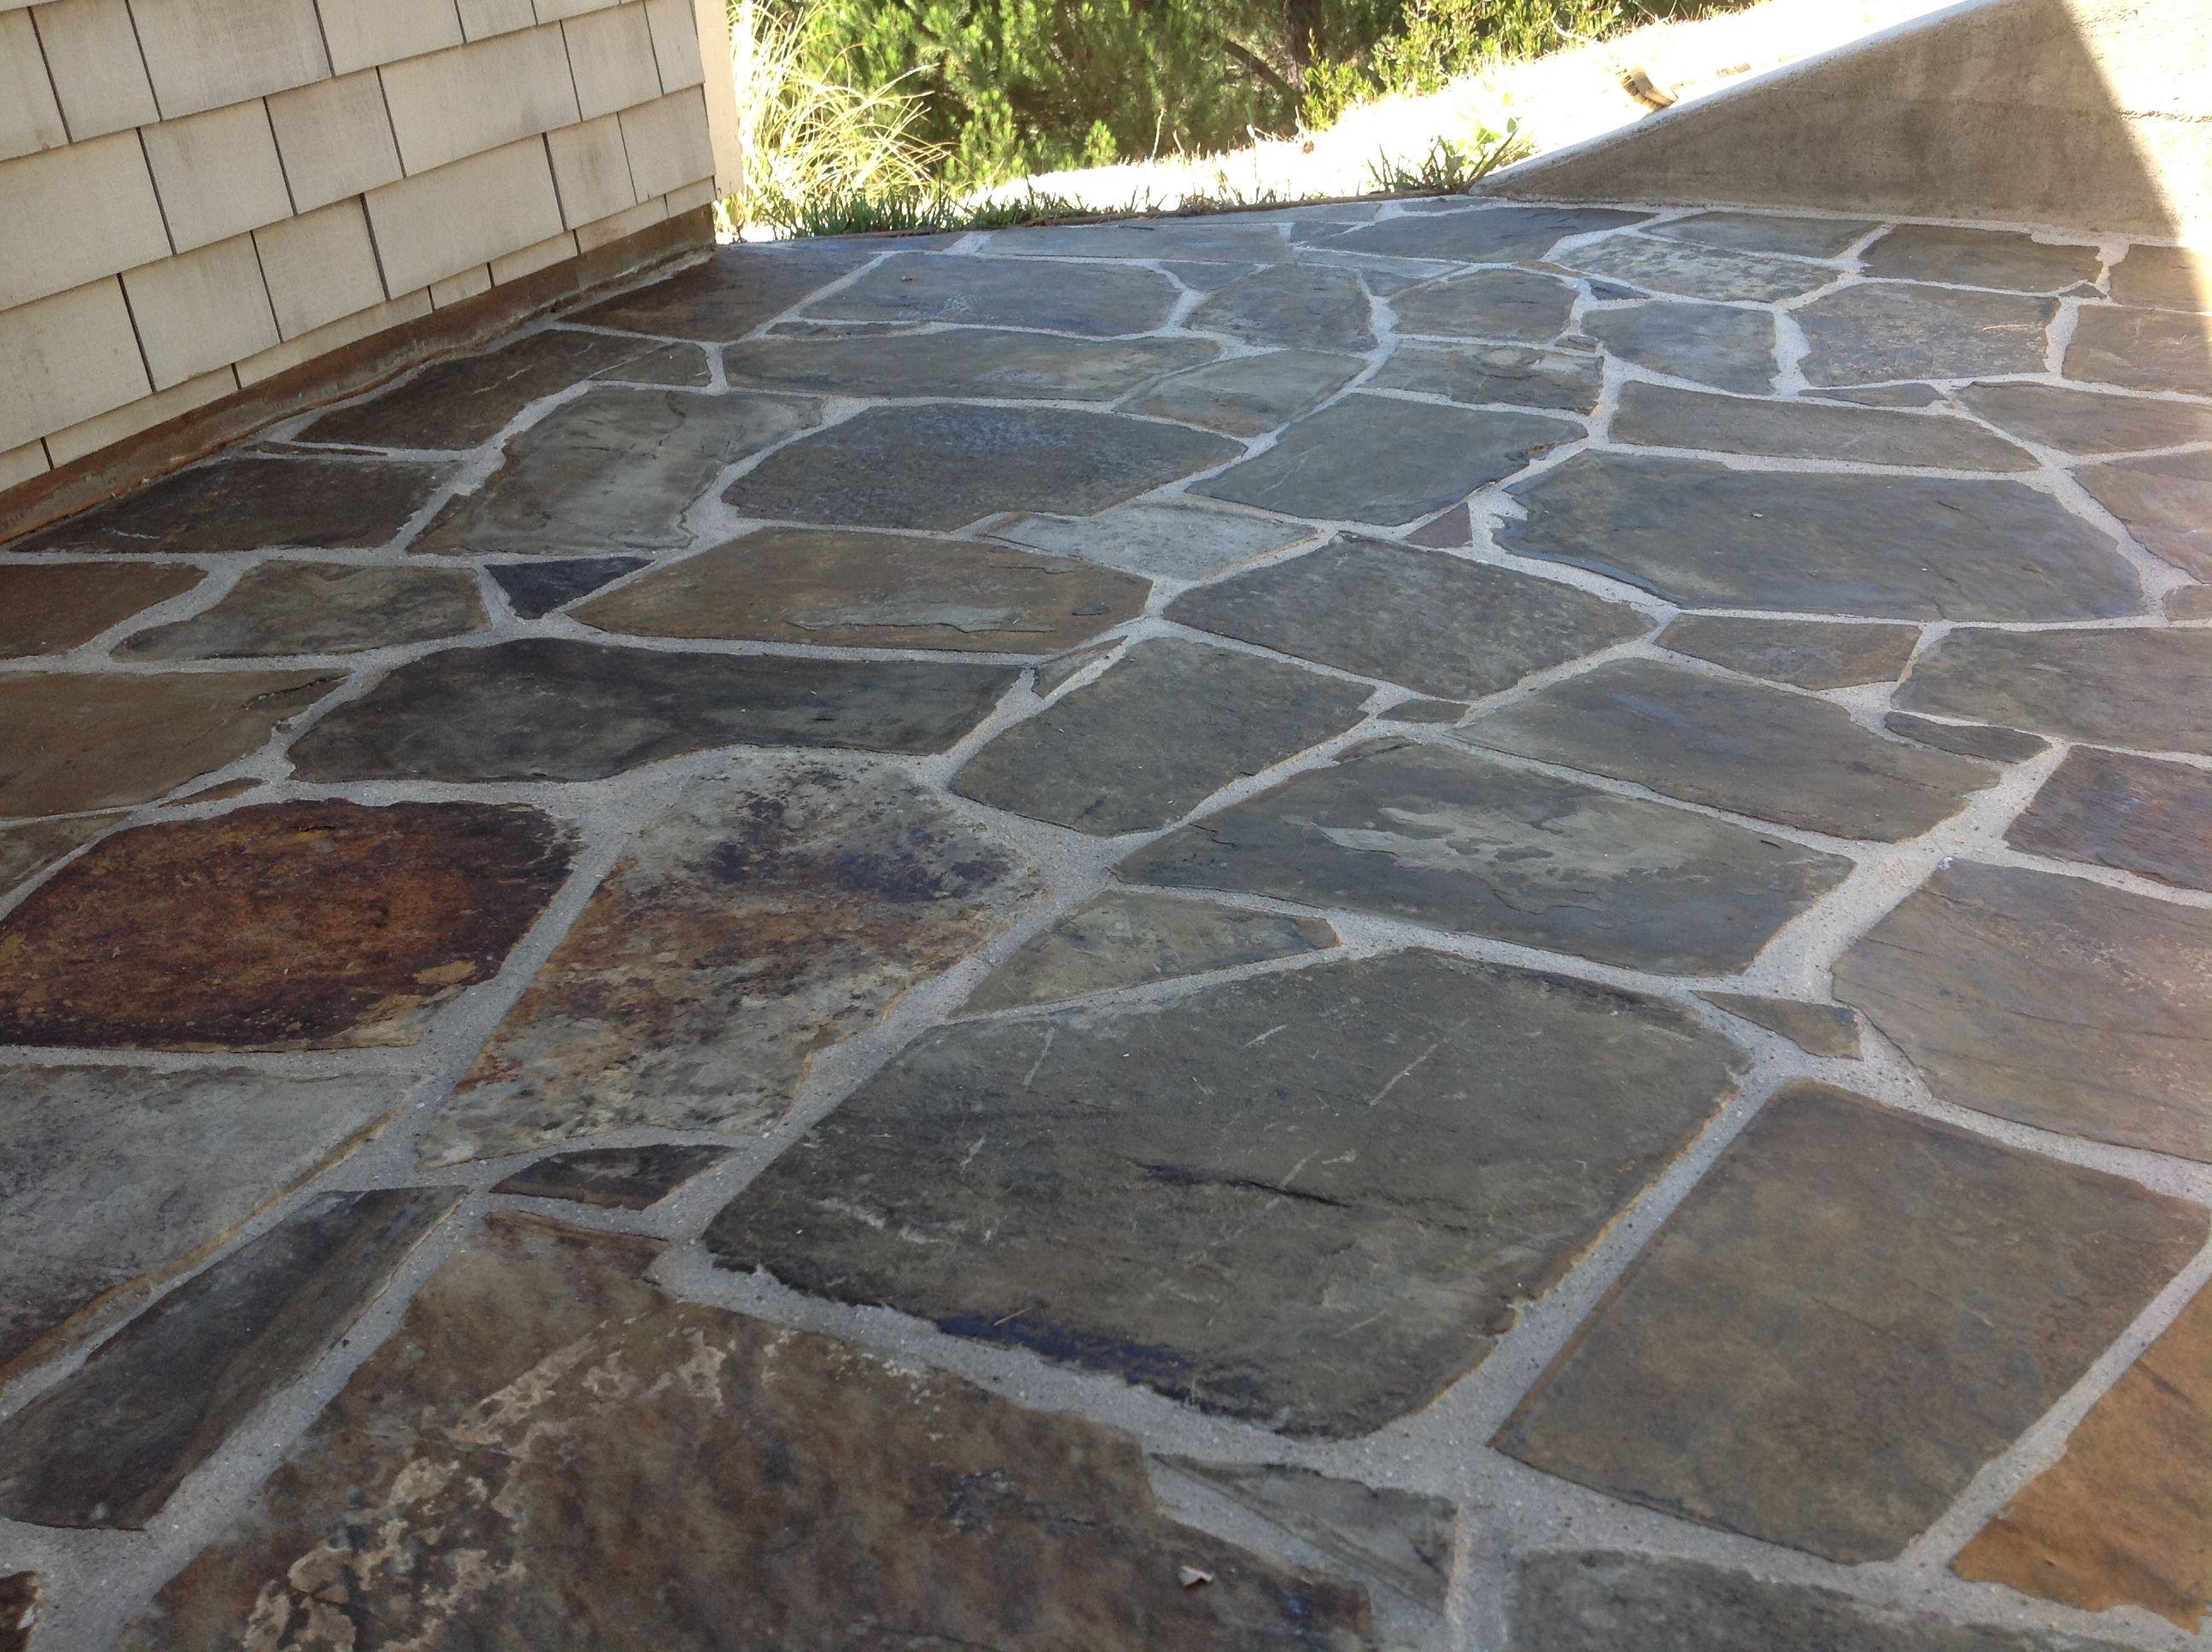 Slate Tile Driving You Crazy? California Tile